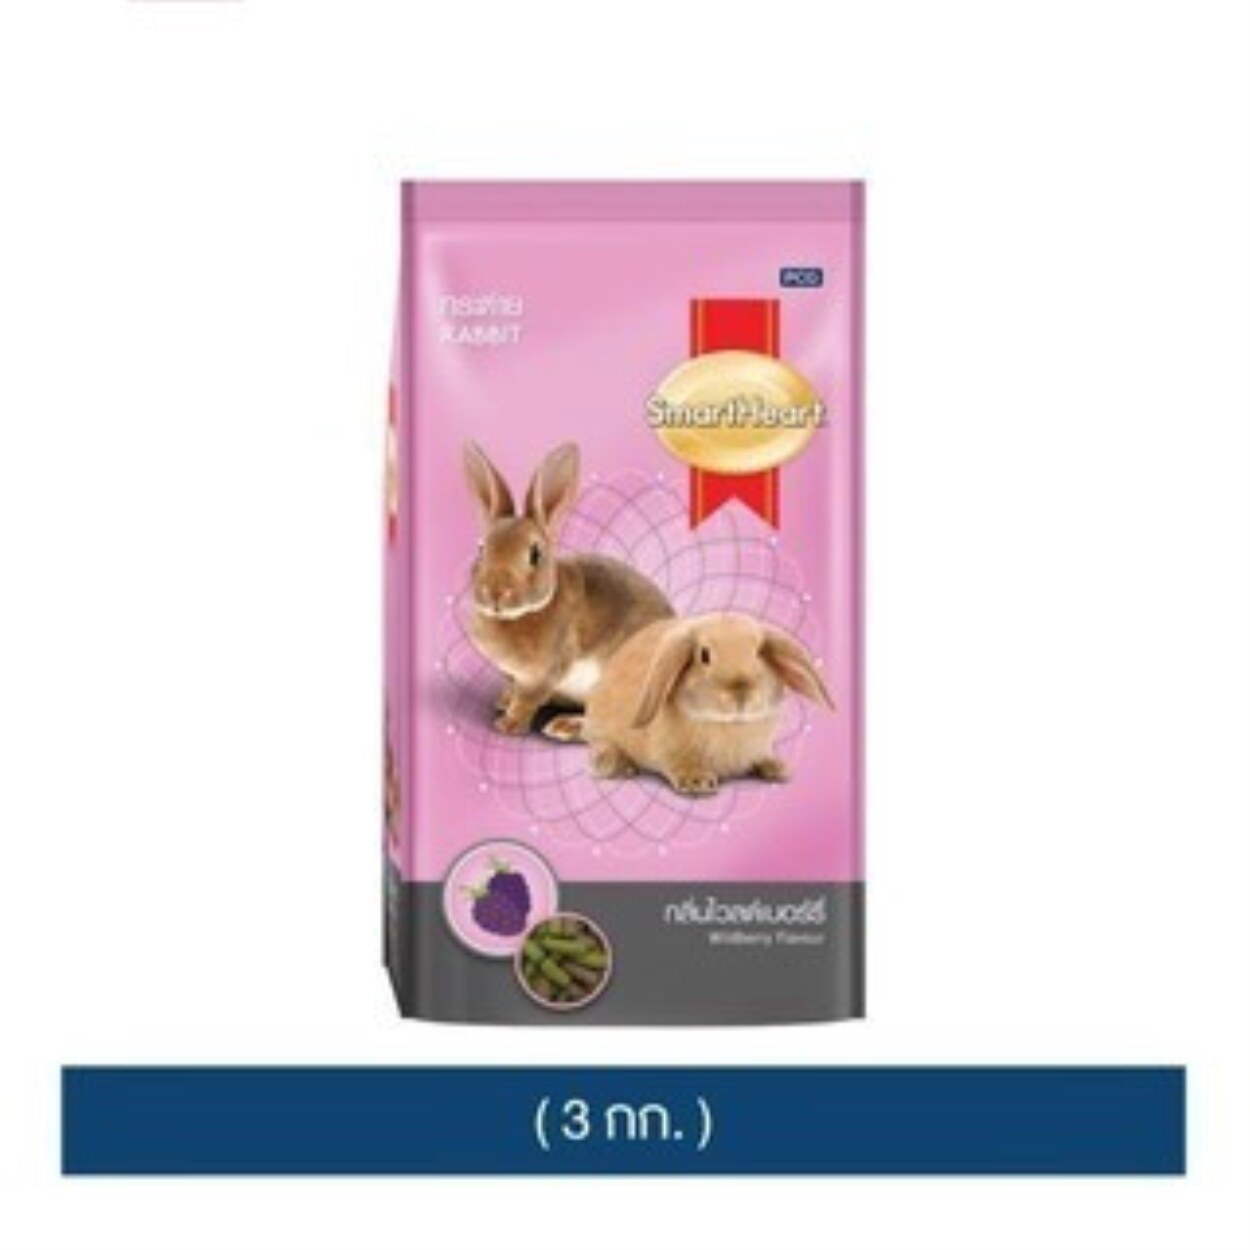 vitakraft สมาร์ทฮาร์ท อาหารกระต่าย - ไวลด์เบอร์รี่ (3 กก.) | SmartHeart Rabbit - Wildberry (3 kg)